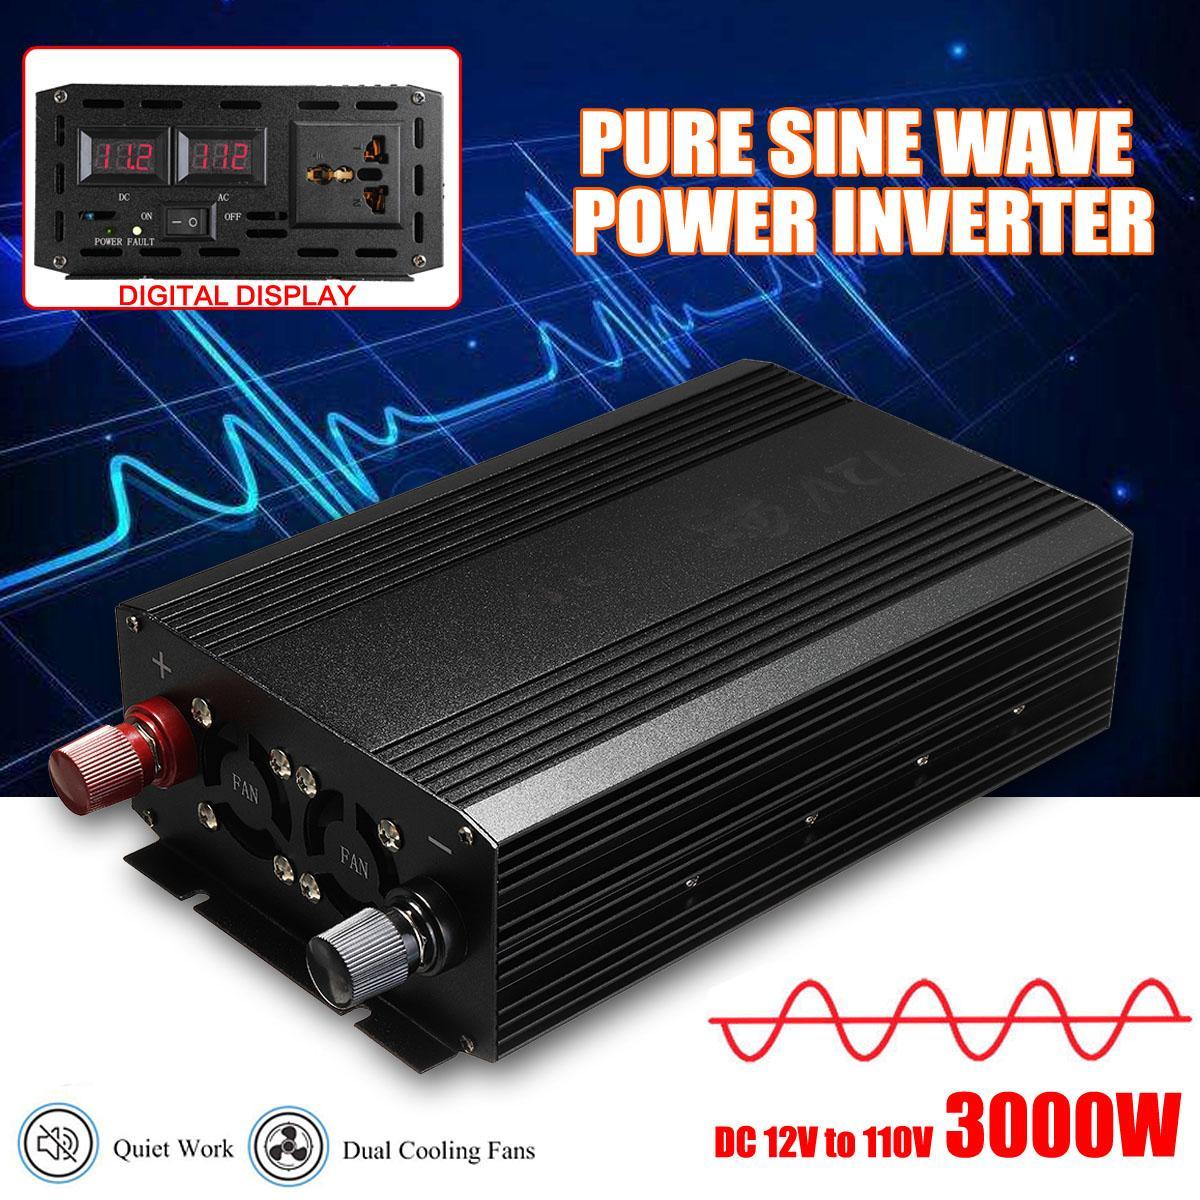 3000W Watt DC 12V to AC 110V 220V Portable Home Car Power Inverter Charger Converter Adapter Pure Sine Wave Voltage Transformer